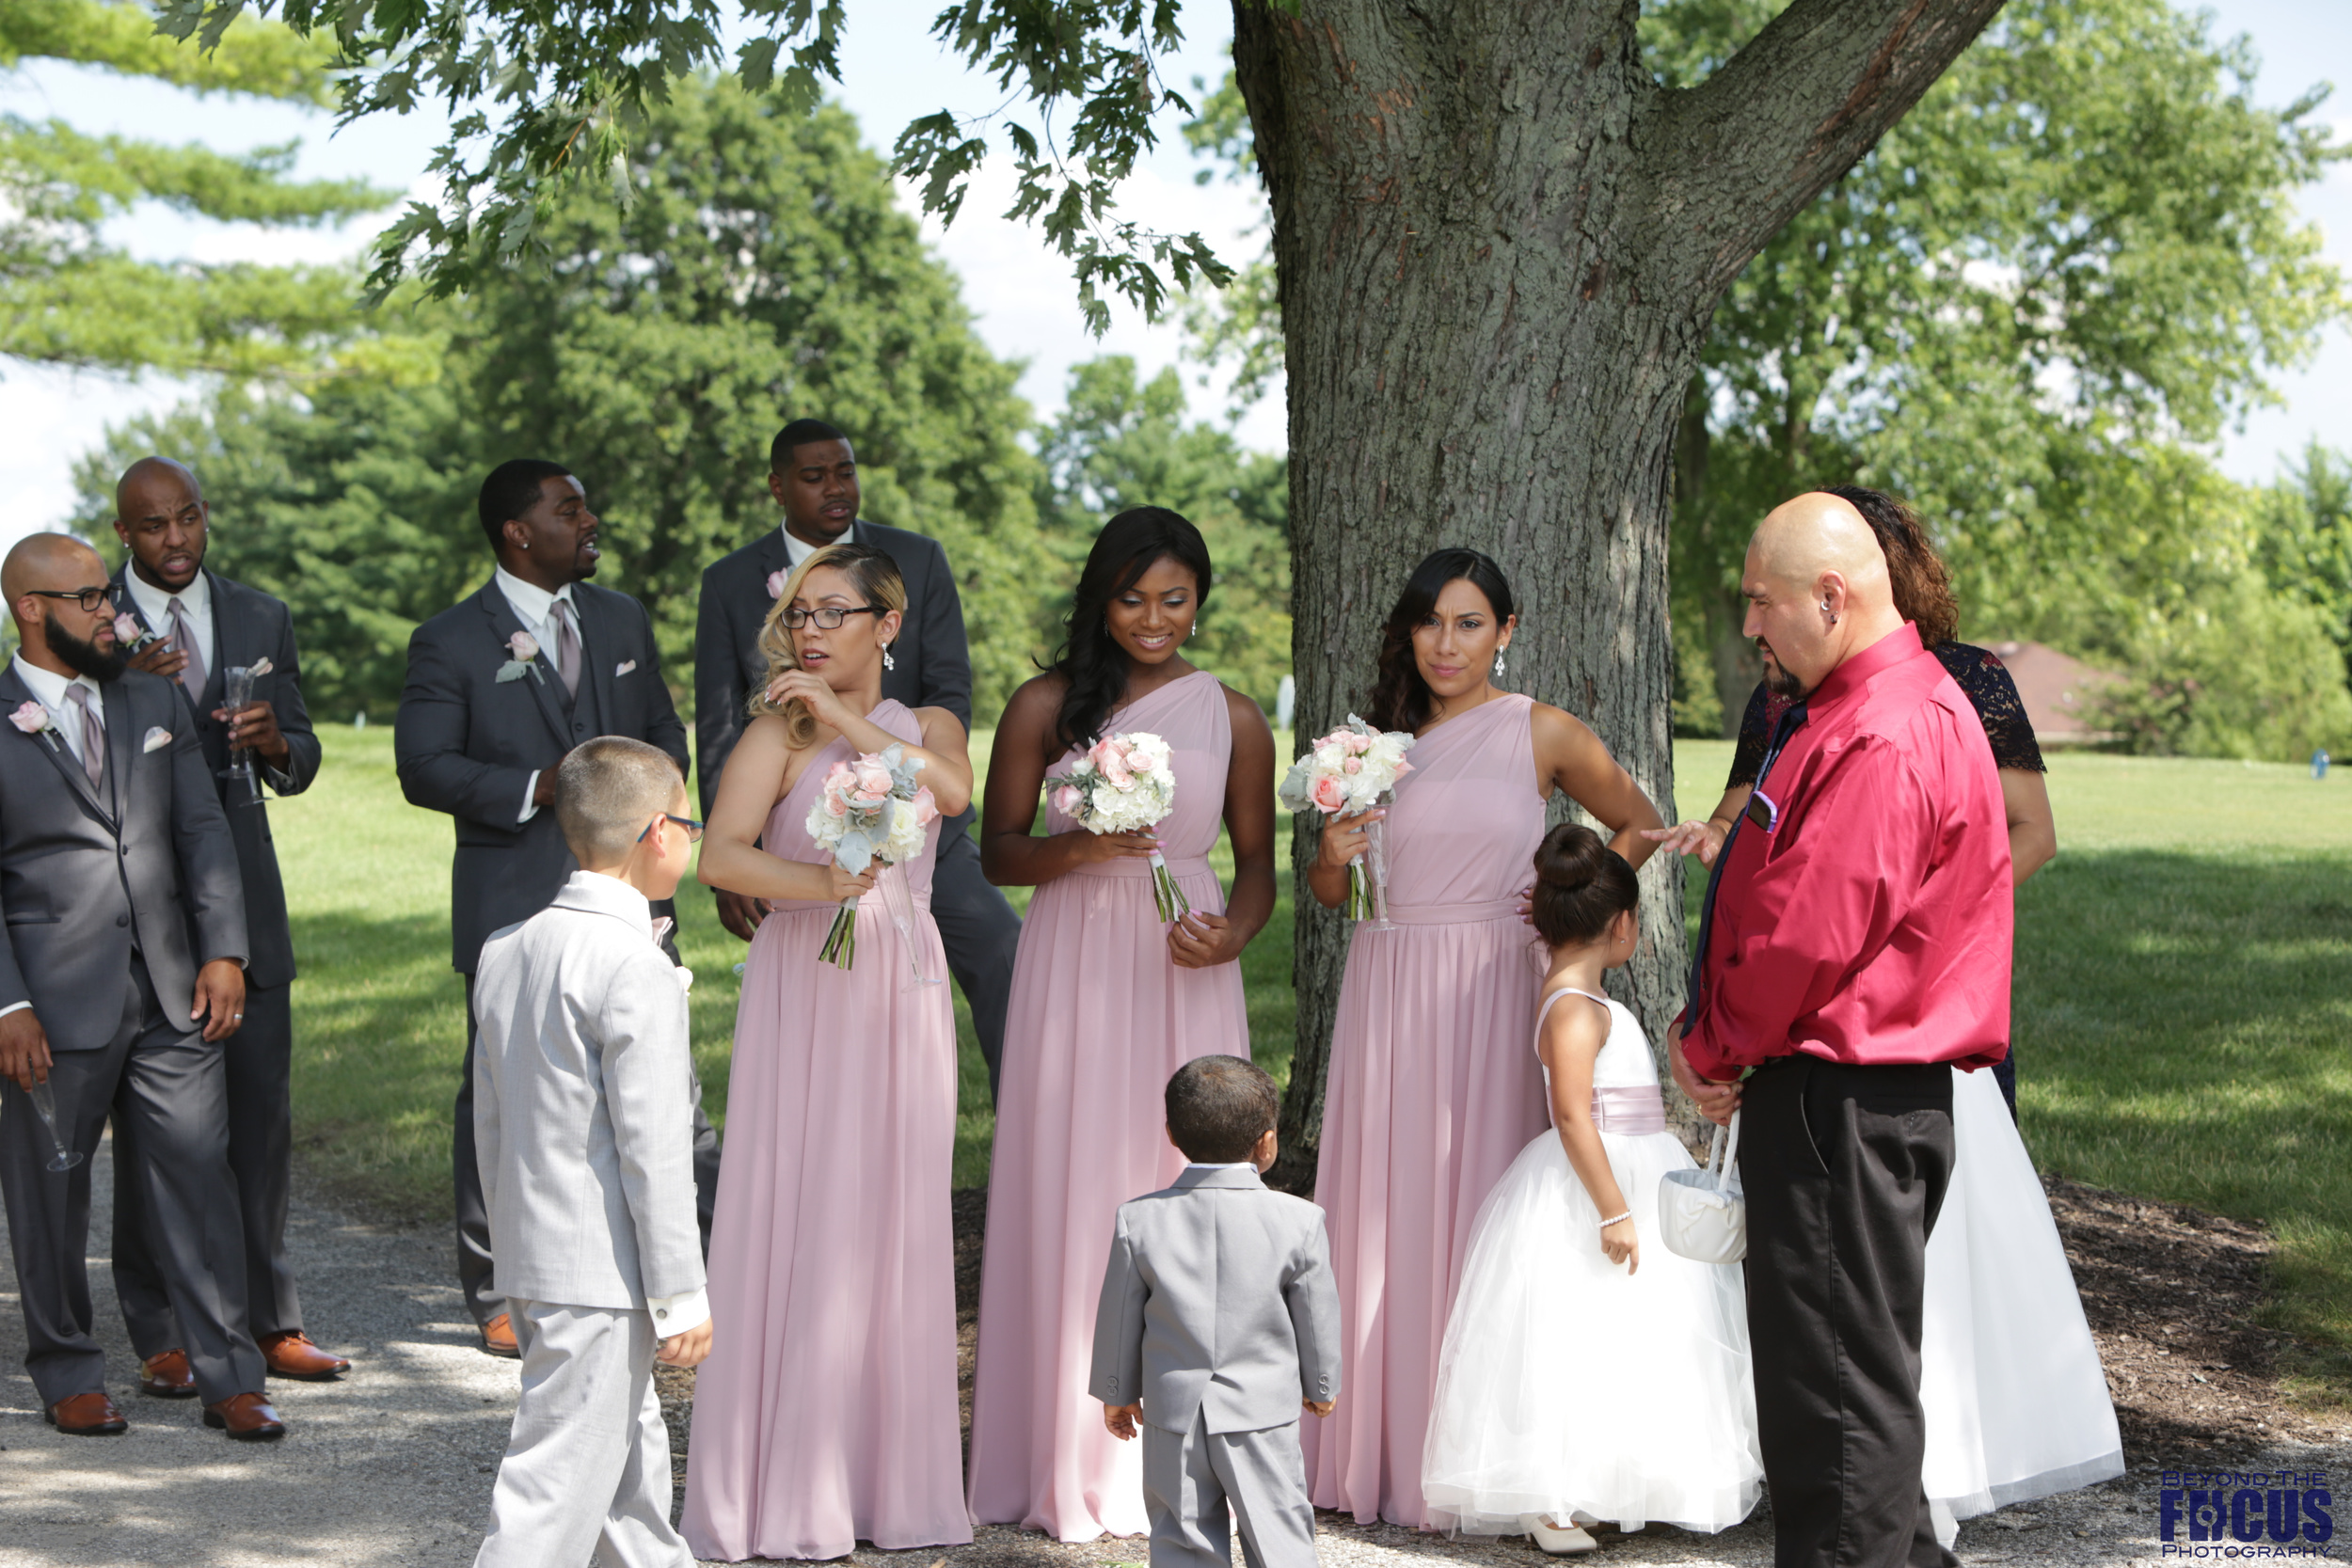 Palmer Wedding - Candids97.jpg